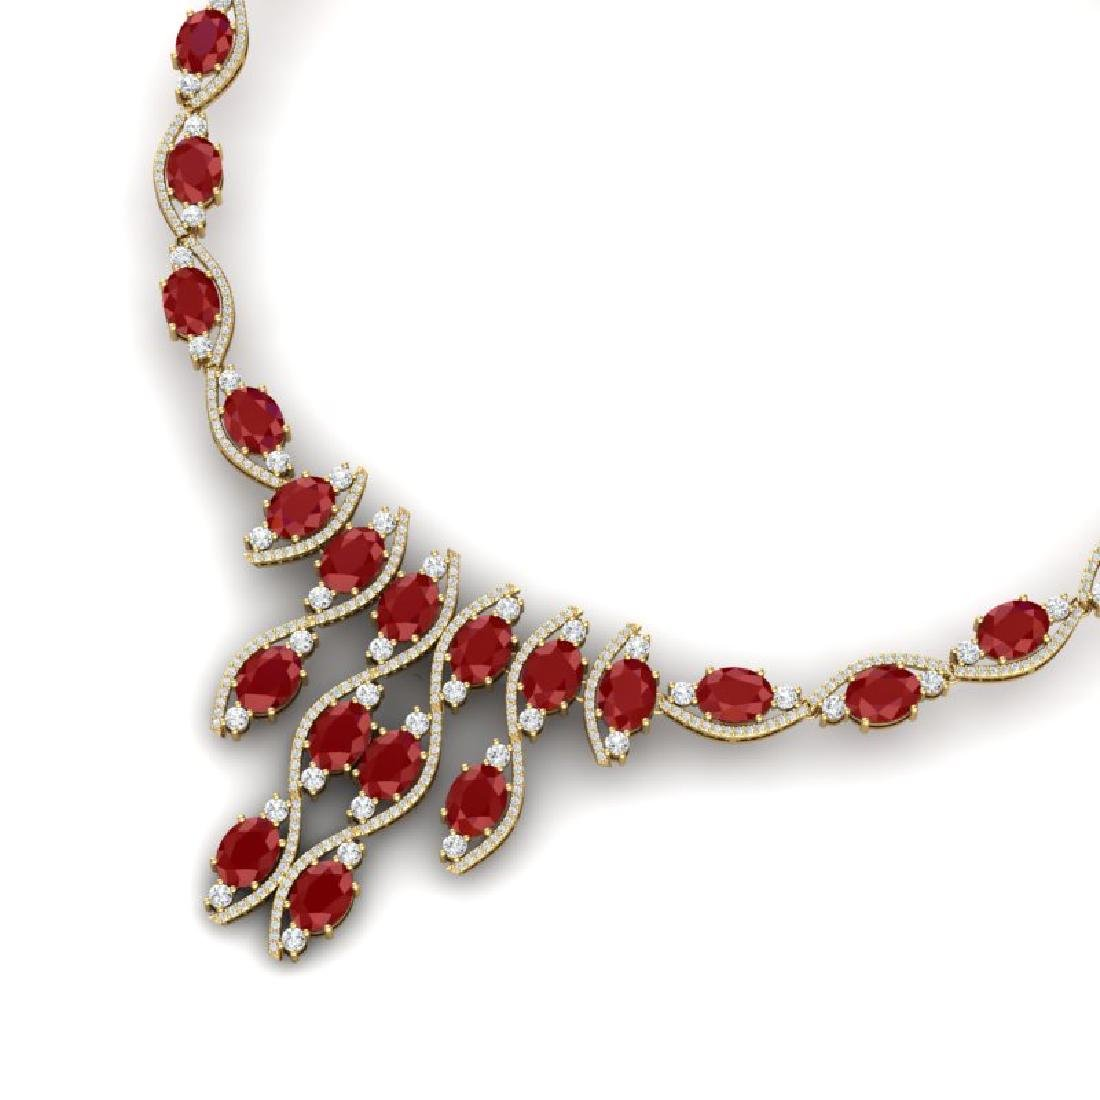 65.93 CTW Royalty Ruby & VS Diamond Necklace 18K Yellow